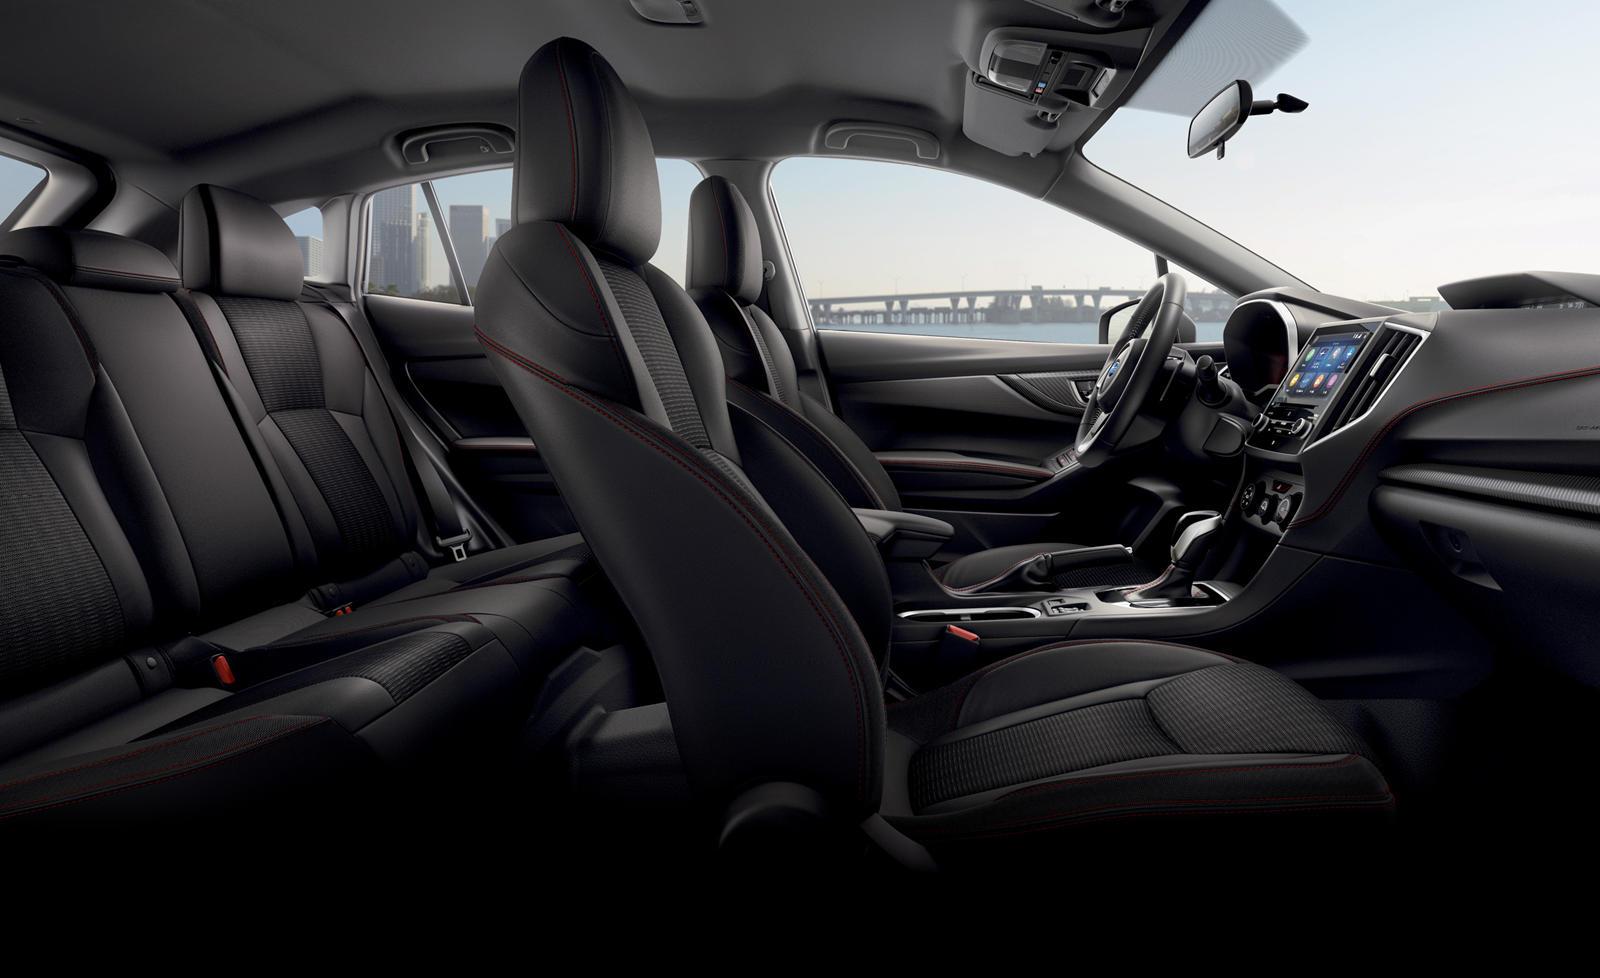 2017-2020 Subaru Impreza Sedan Interior Overview